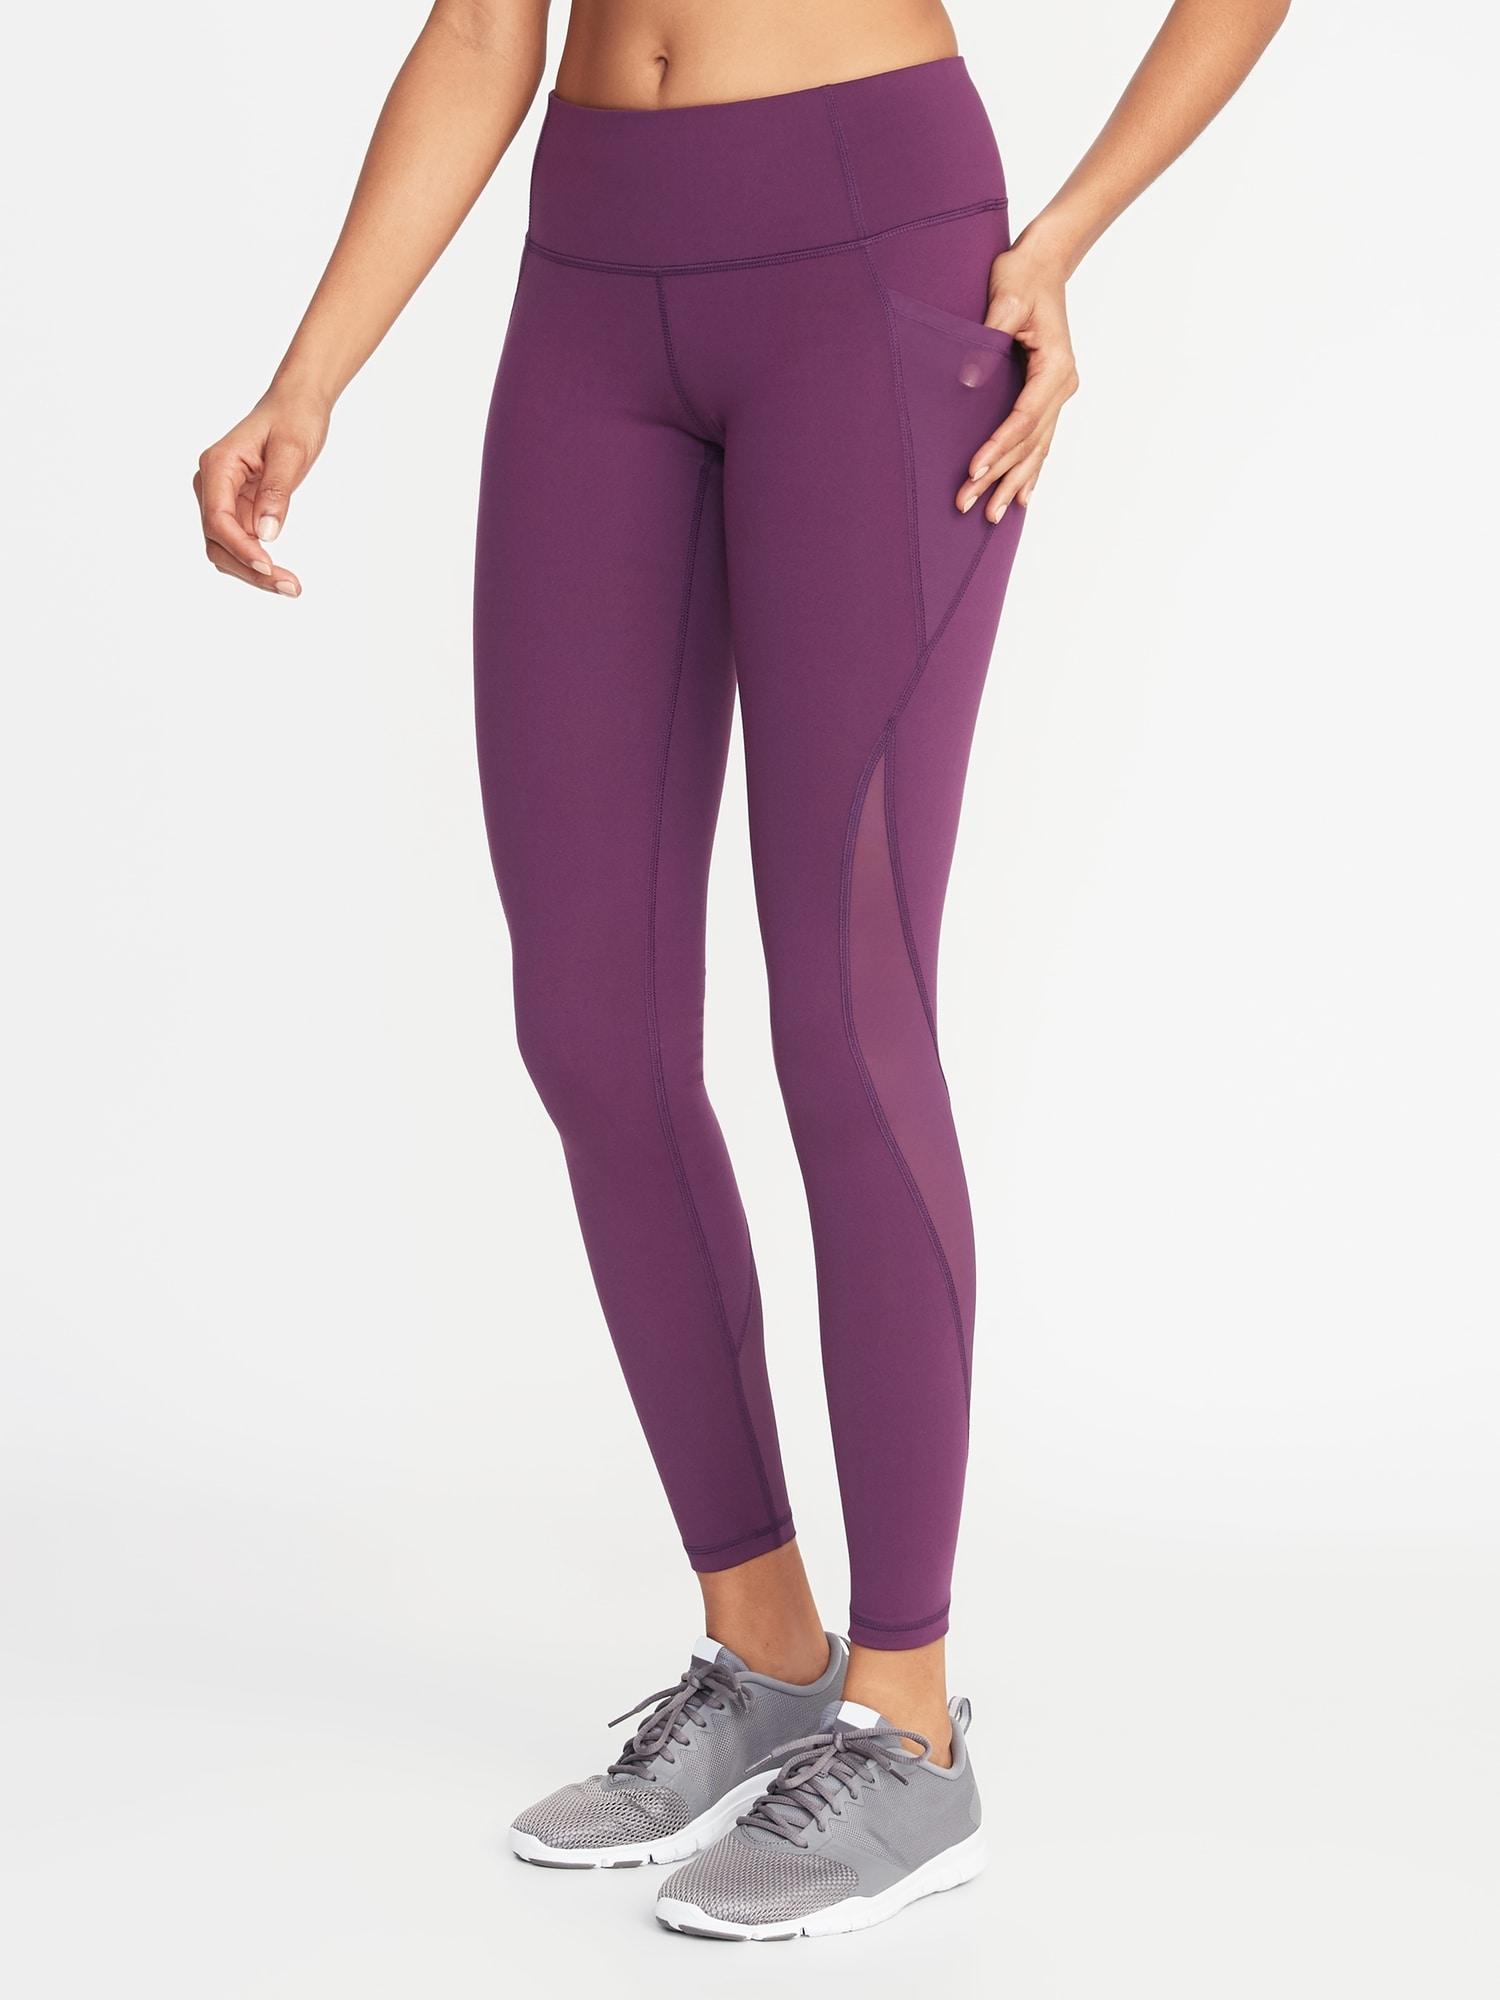 051038f2d1652 Mid-Rise Elevate Side-Pocket Mesh-Trim Compression Leggings for Women